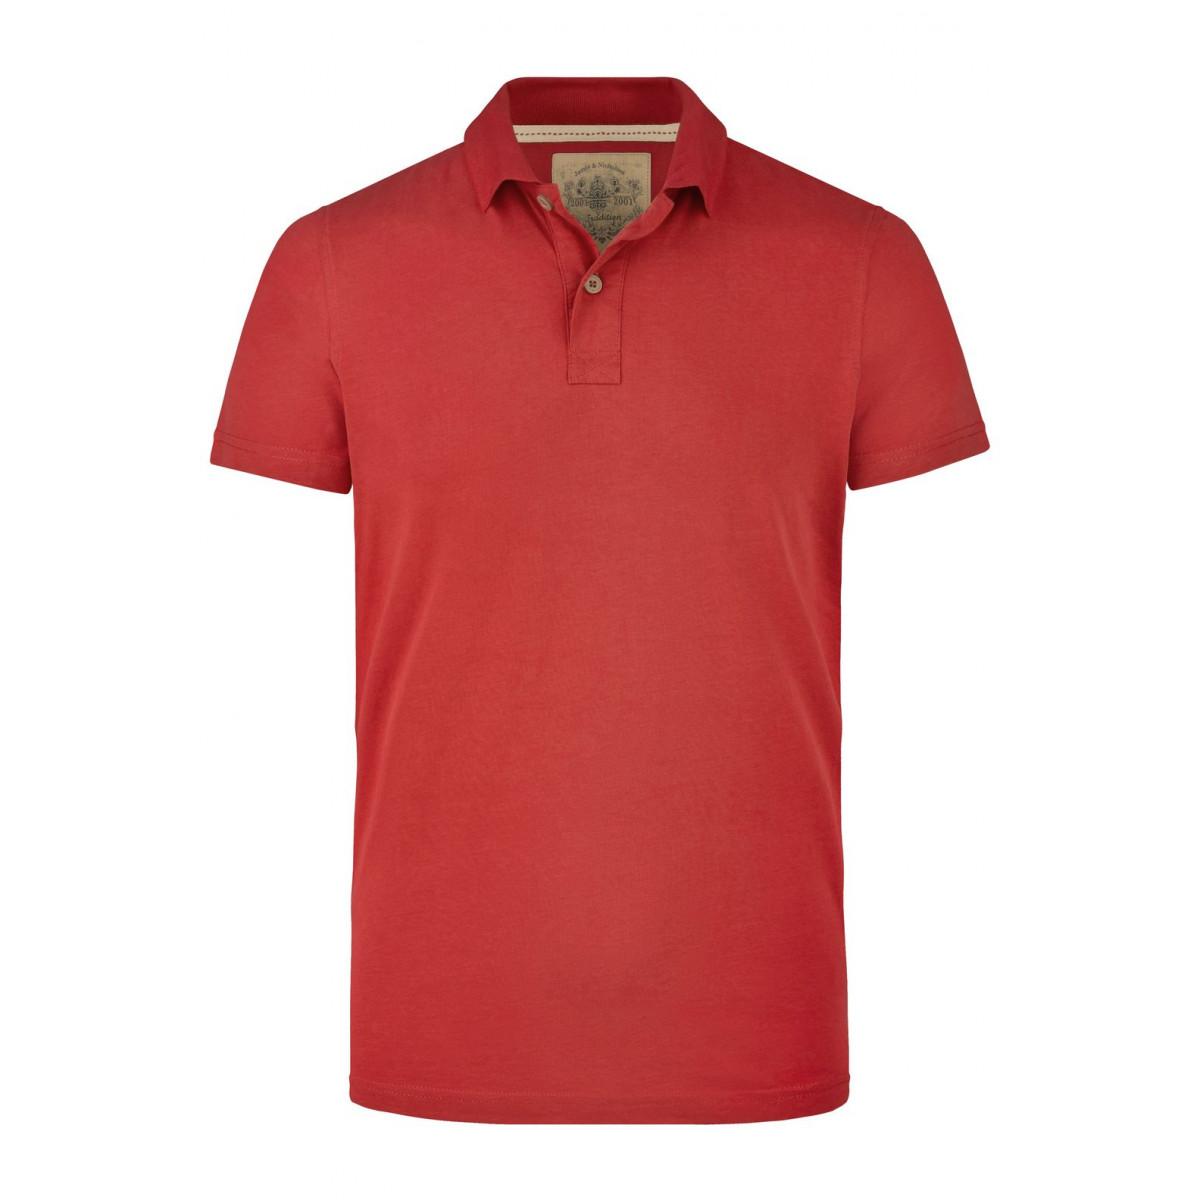 Рубашка поло мужская JN941 Mens Vintage Polo - Красный